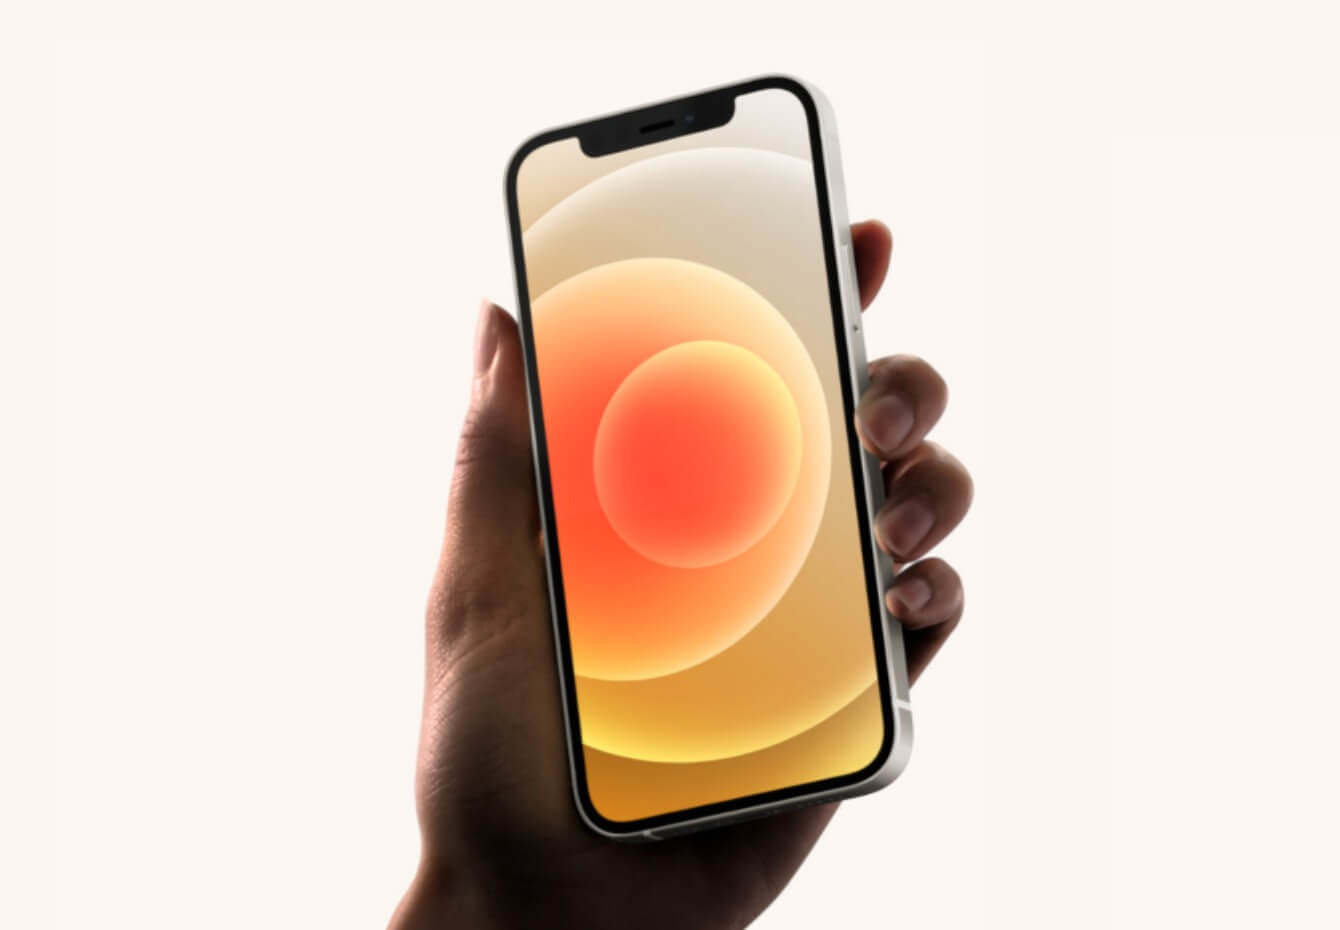 iPhone 12 ได้ผู้ผลิตหน้าจอ OLED ใหม่เป็น BOE แทน Samsung